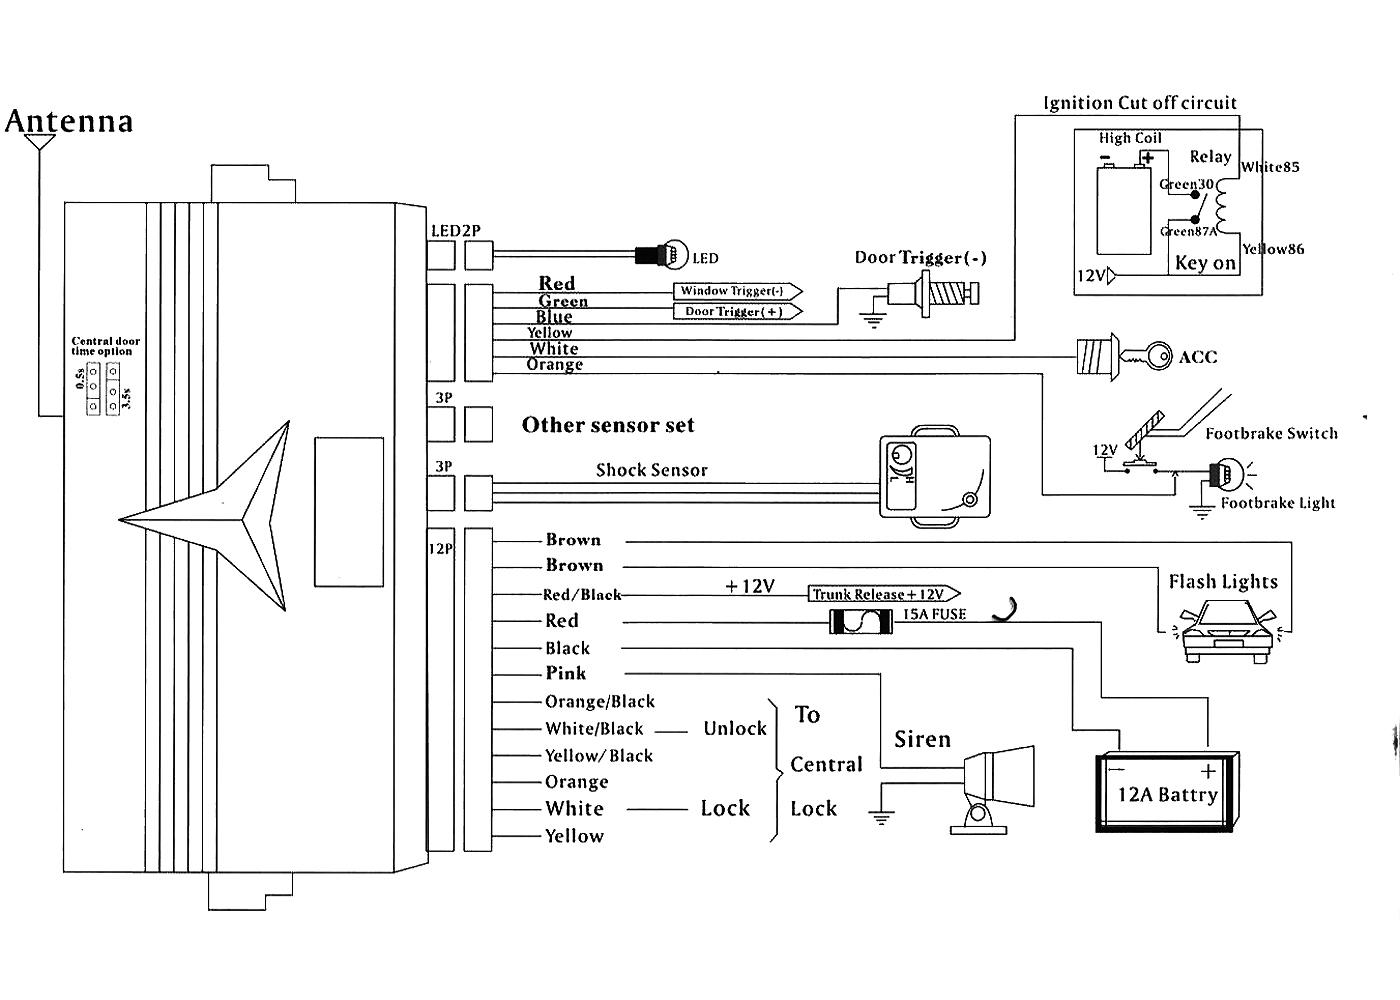 Alarm blower motor wiring diagram blower motor wiring diagram 04 volvo center console boat wiring diagram at gsmx.co